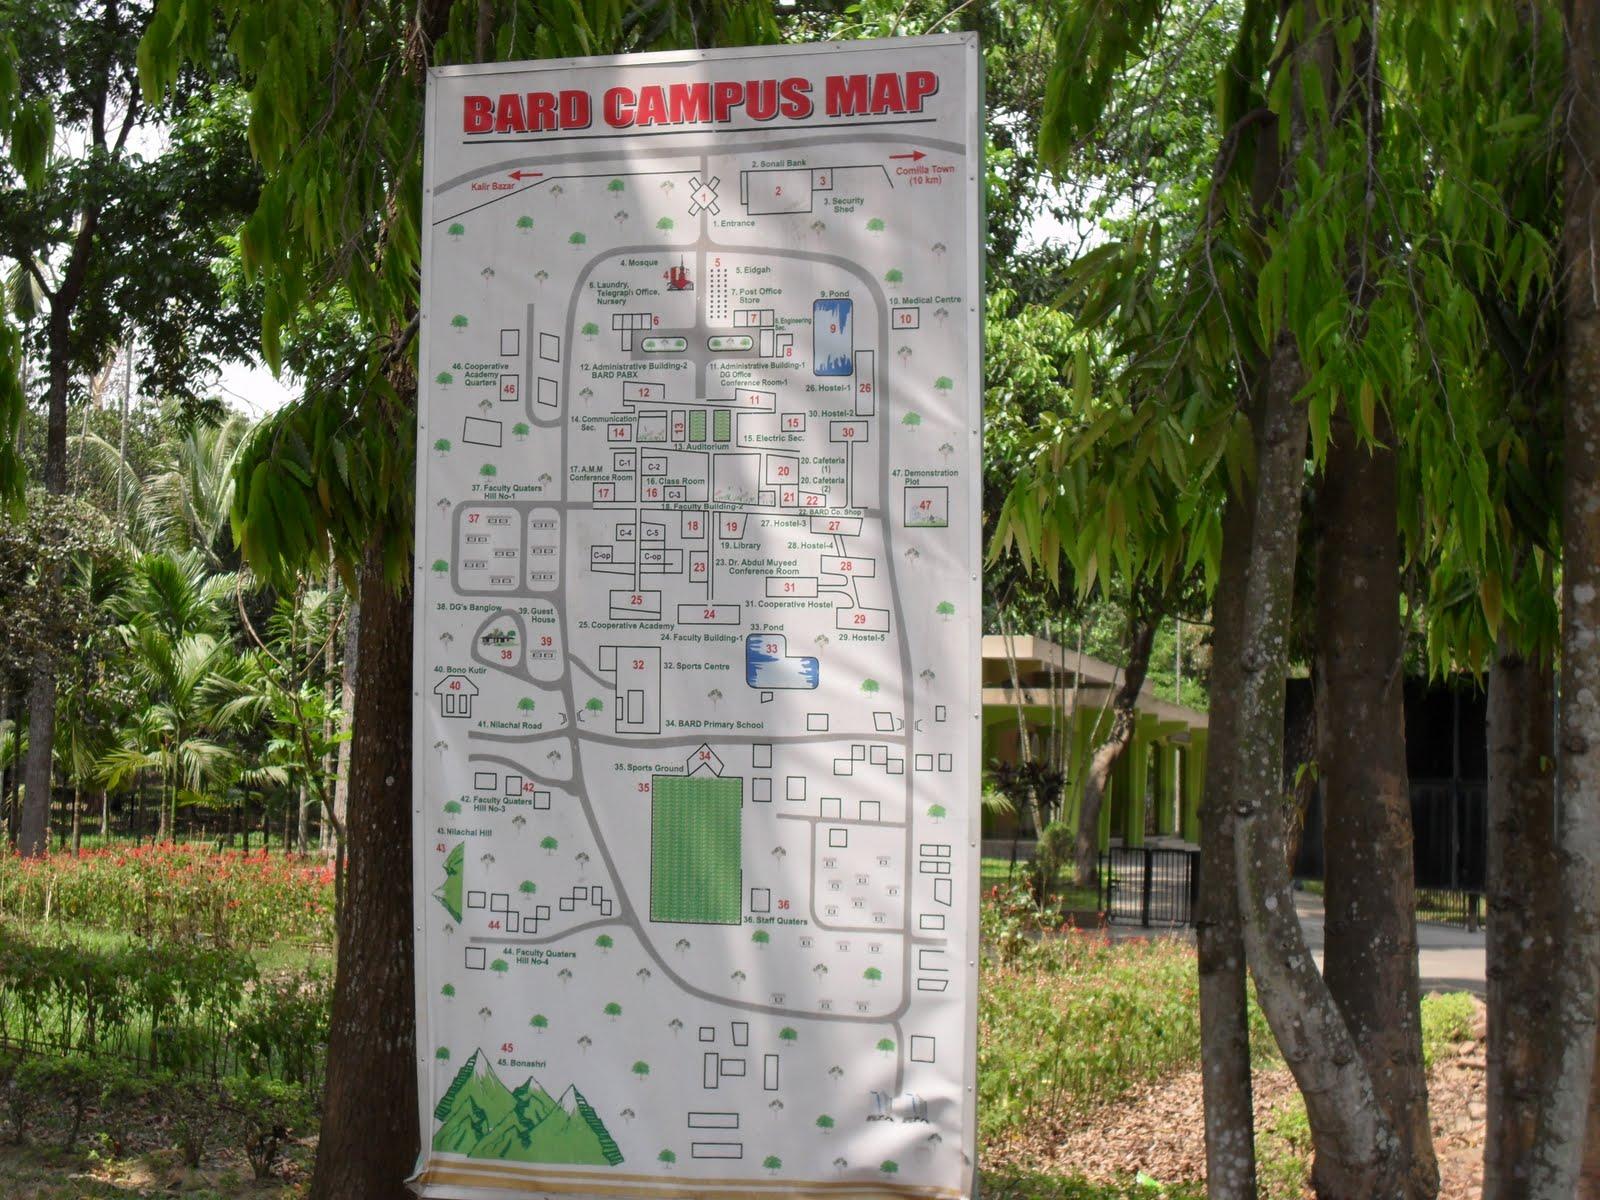 Bangladesh Academy for Rural Development - Comilla | Lonely Traveler